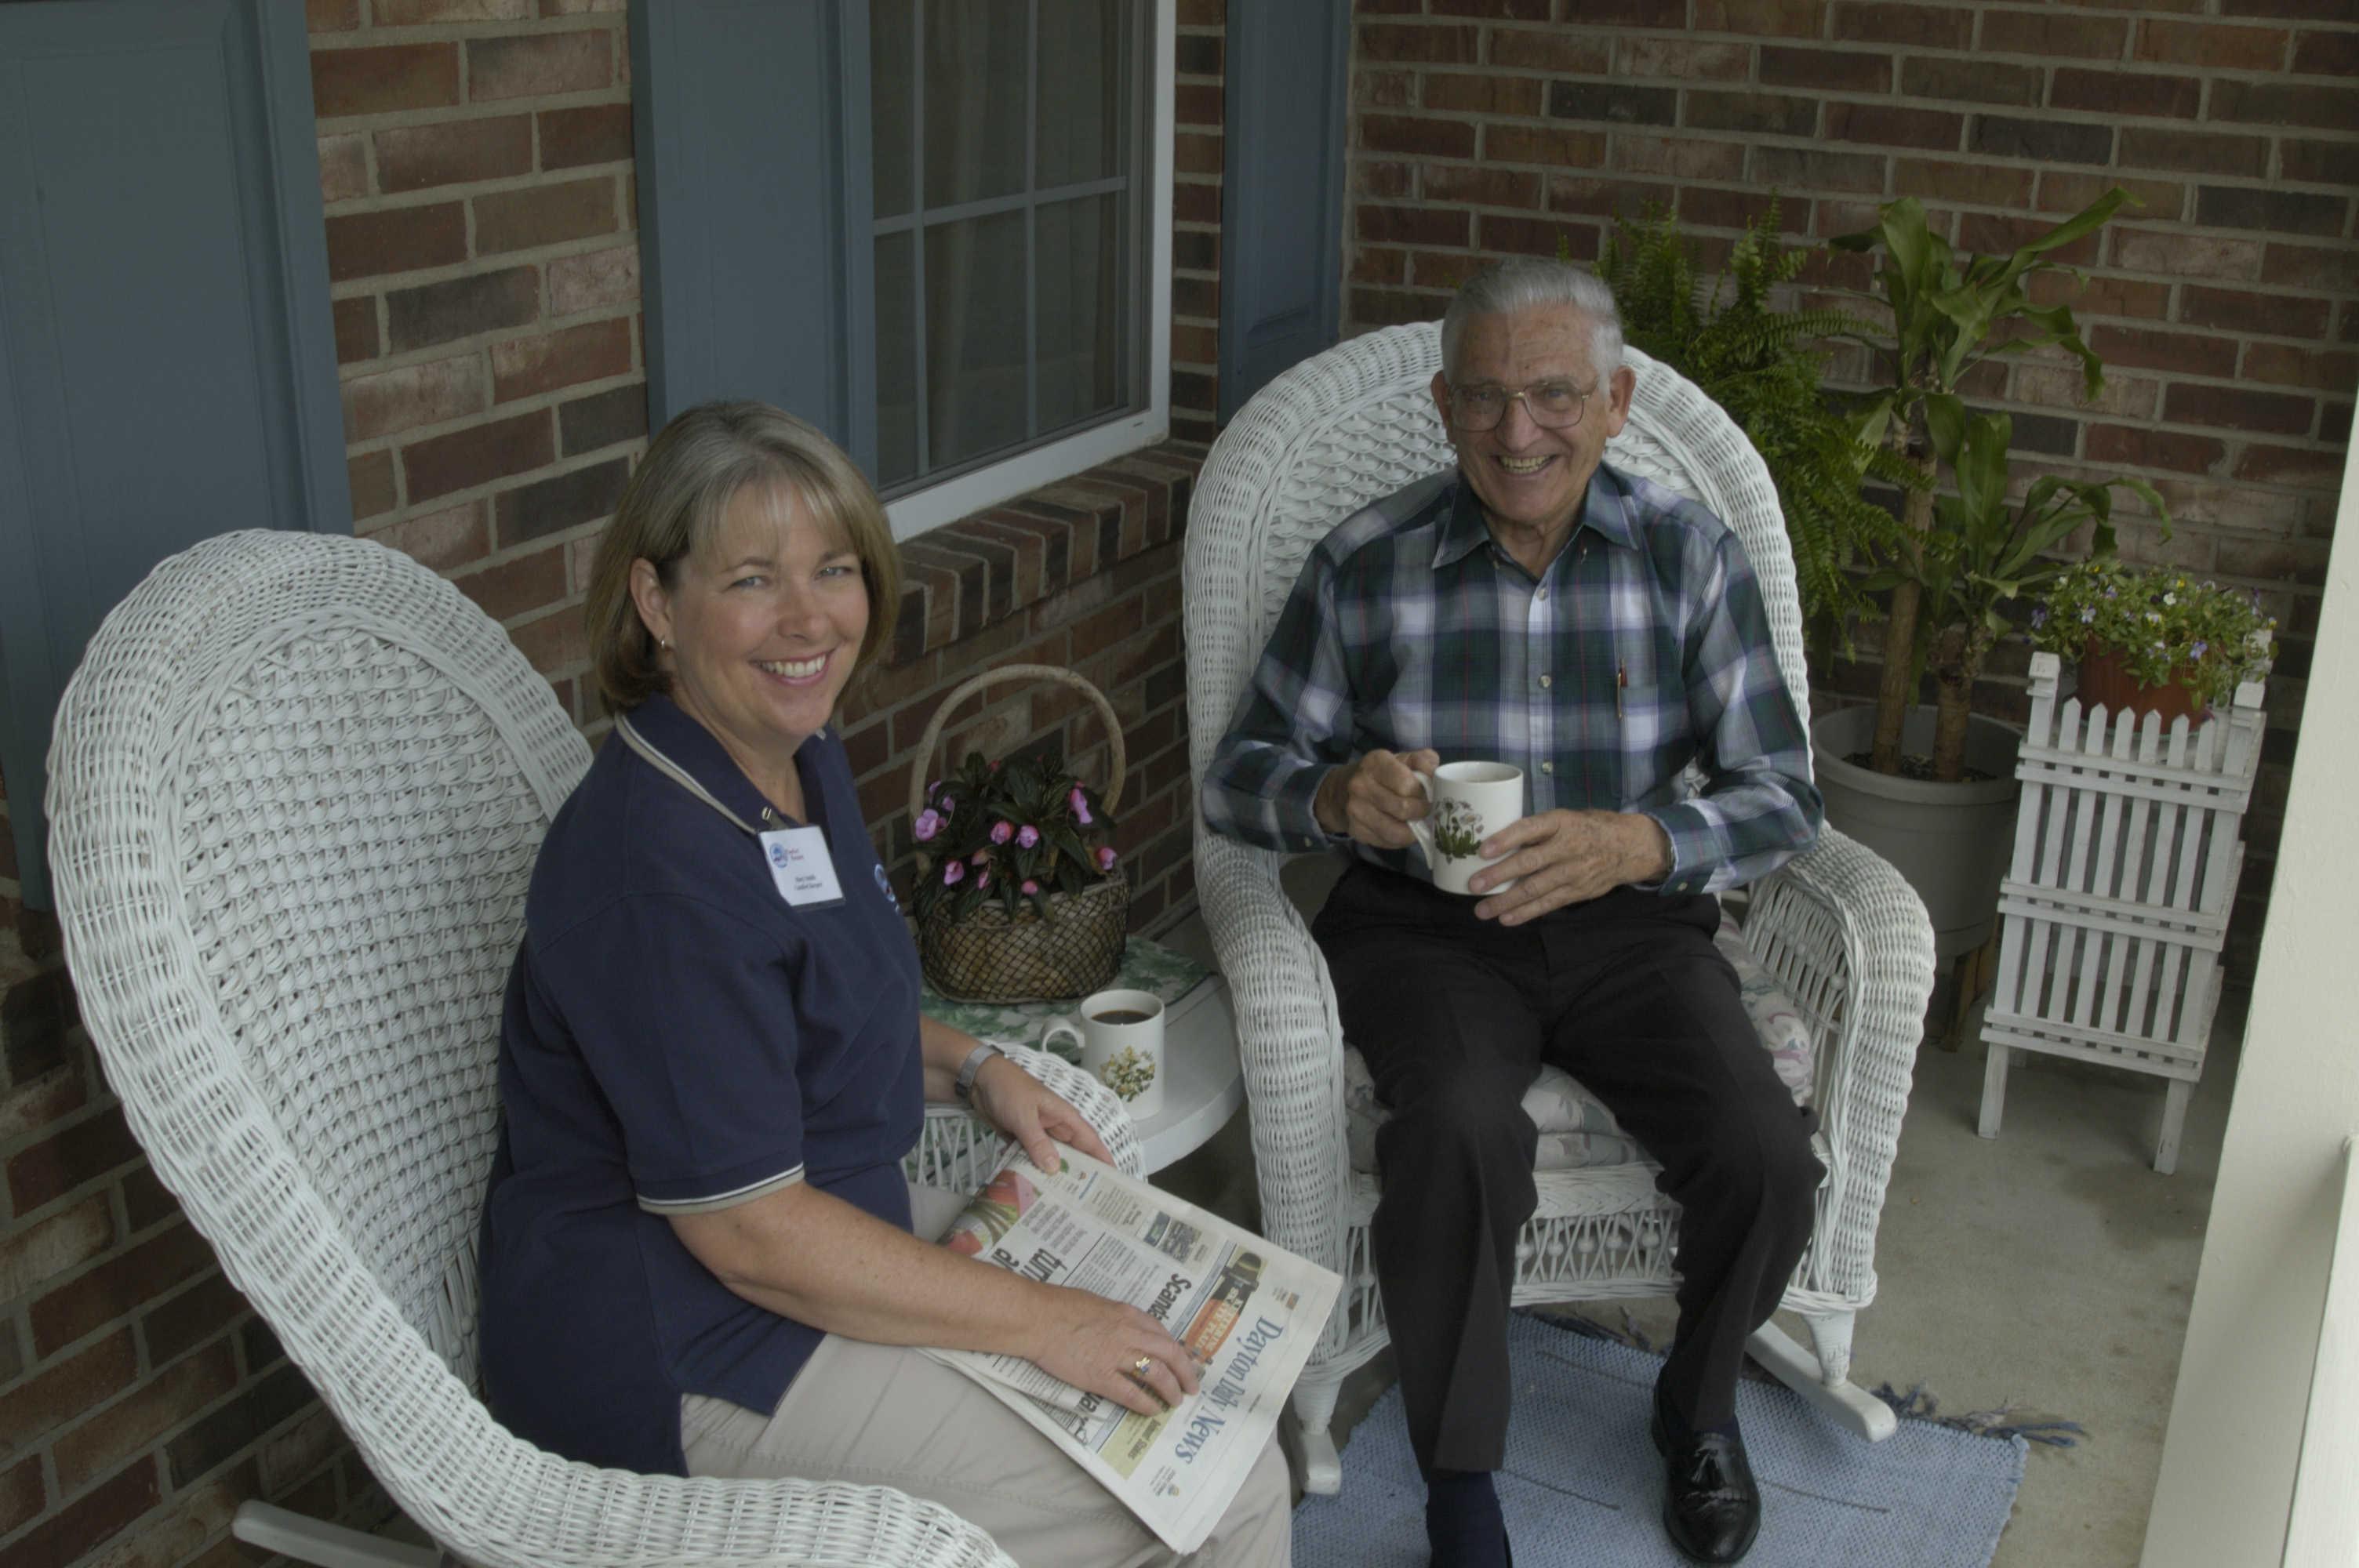 Elder Care Conversation